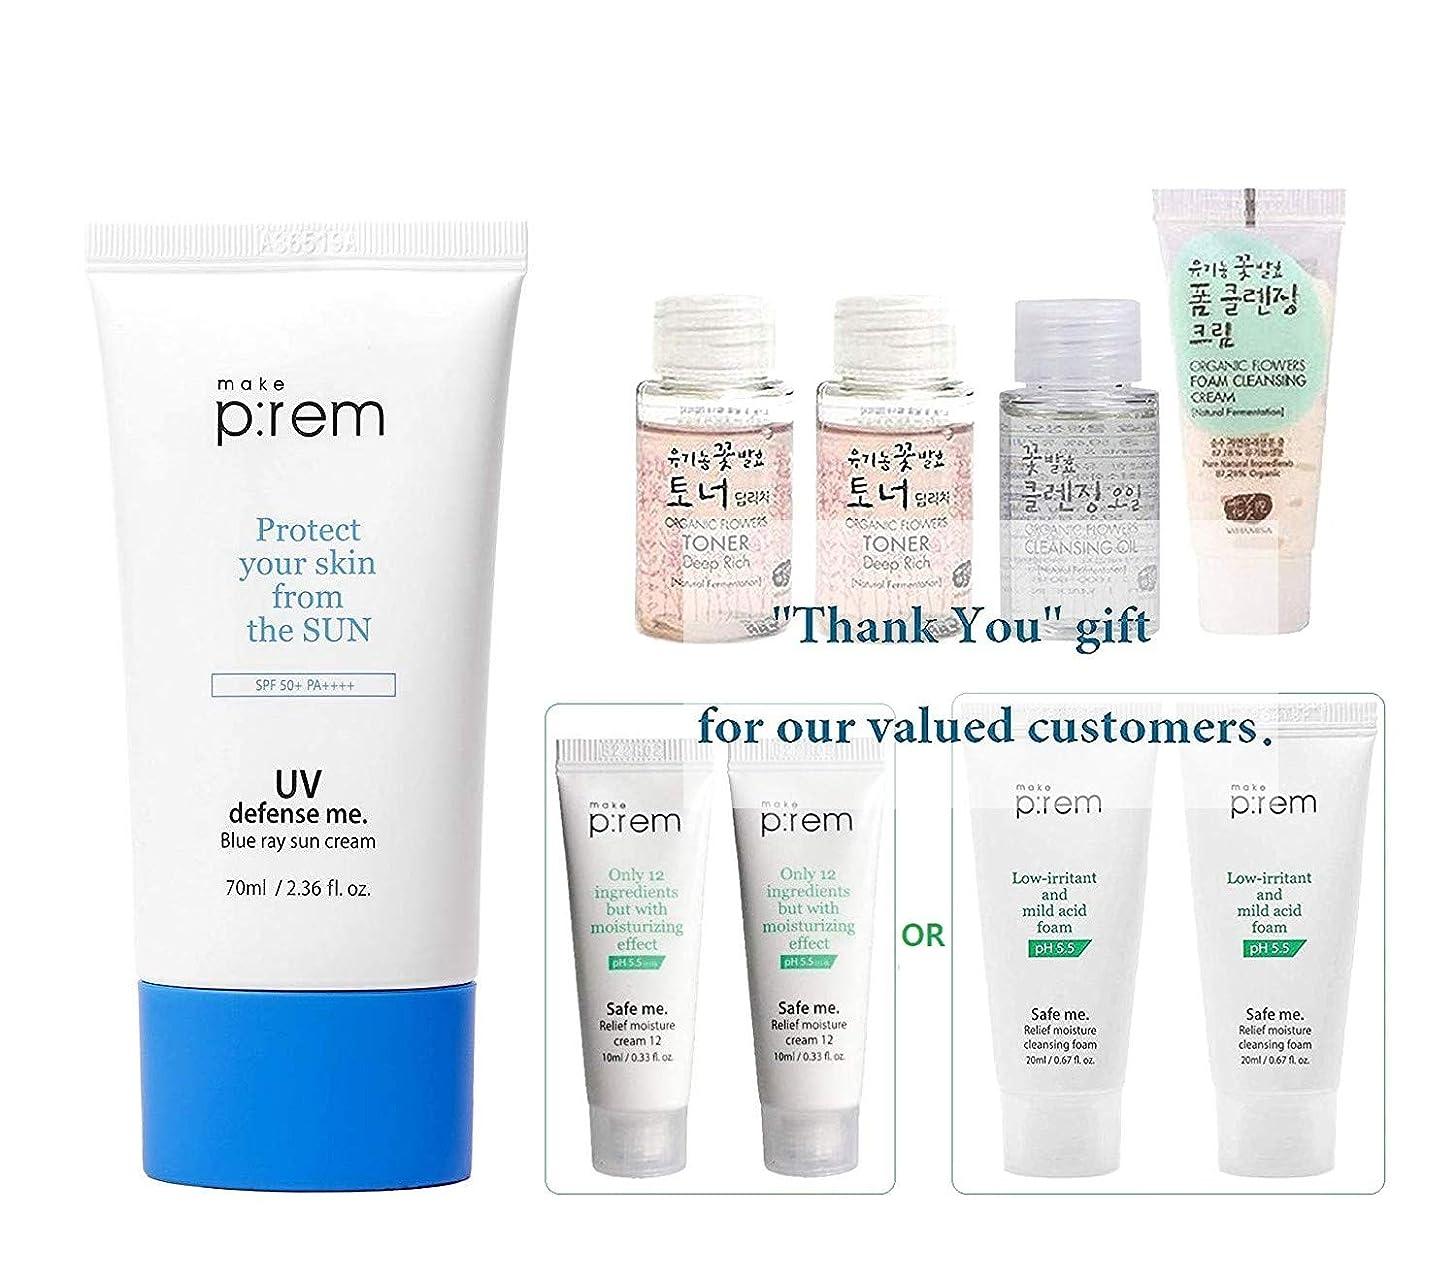 MAKEP:REM UV Defense Me Blue Ray Sun Cream - Sunscreen 70ml / 2.36 fl.oz. & Moisture cream mini 20ml, Whamisa Essence Toner 40ml, Cleanser 20ml x2 | SPF 50+ PA++++ by MAKEPREM MAKE P:REM